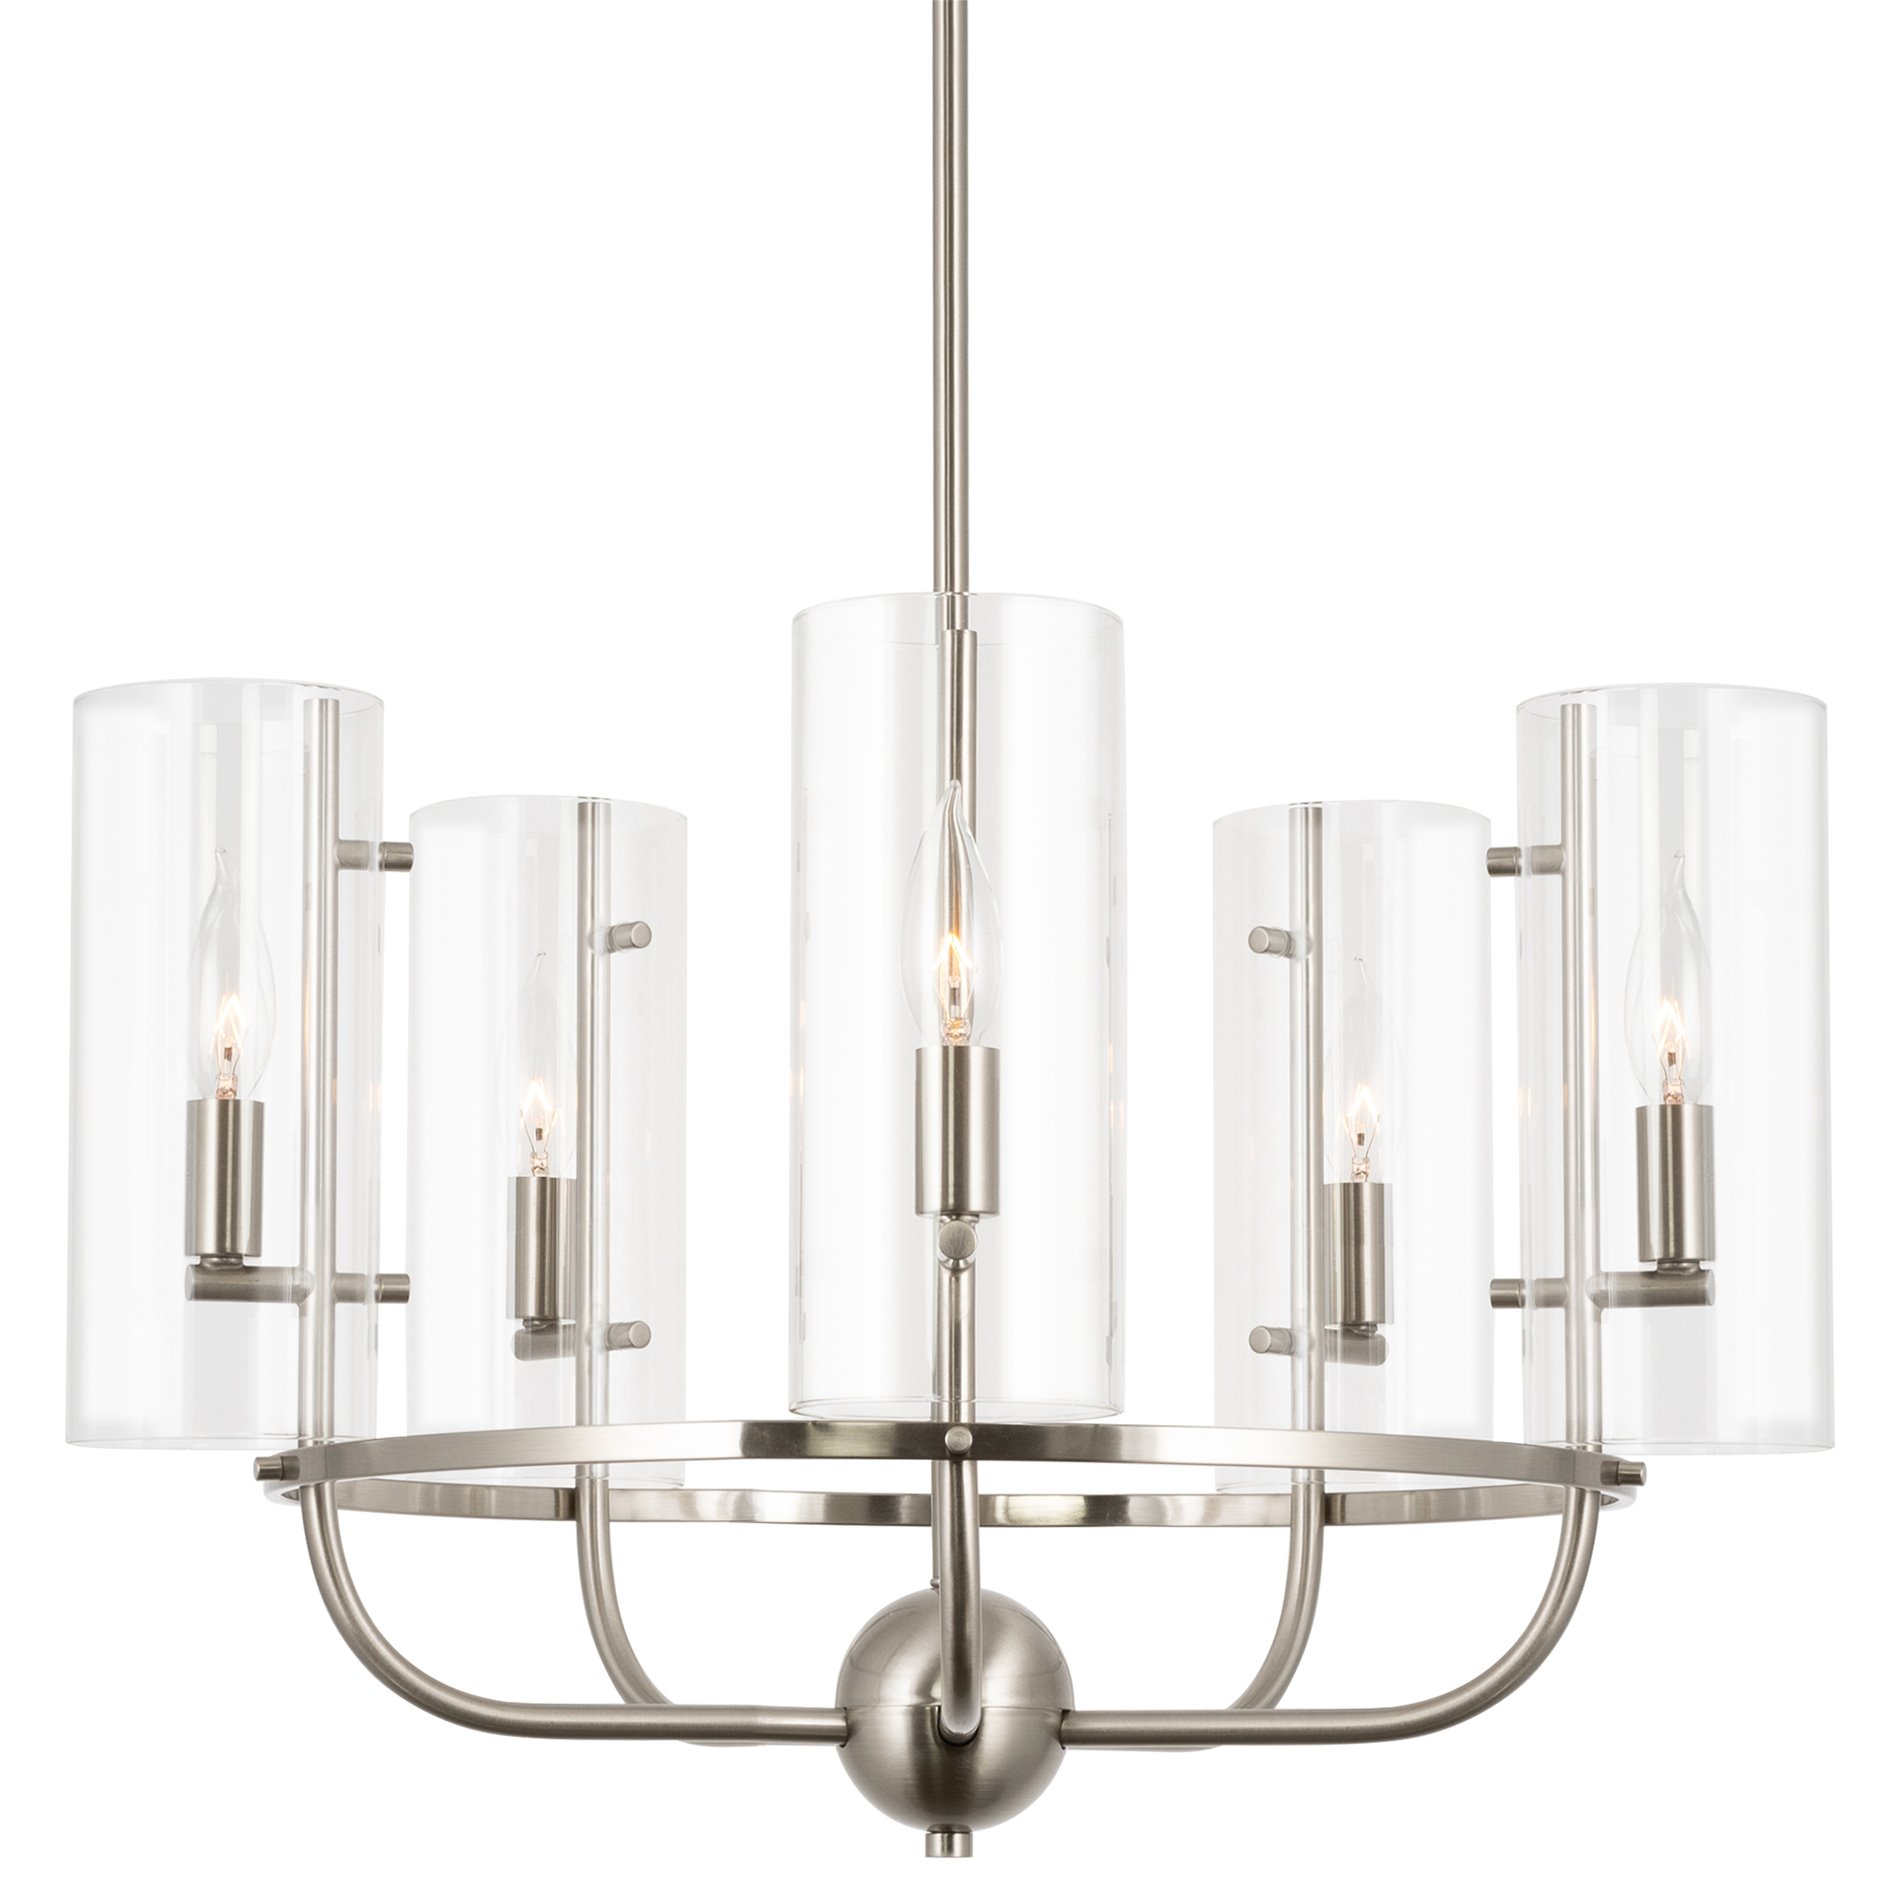 Image of: Kira Home Inara 22 5 Large Round 5 Light Modern Chandelier Clear Glass Shades Adjustable Height Brushed Nickel Walmart Com Walmart Com